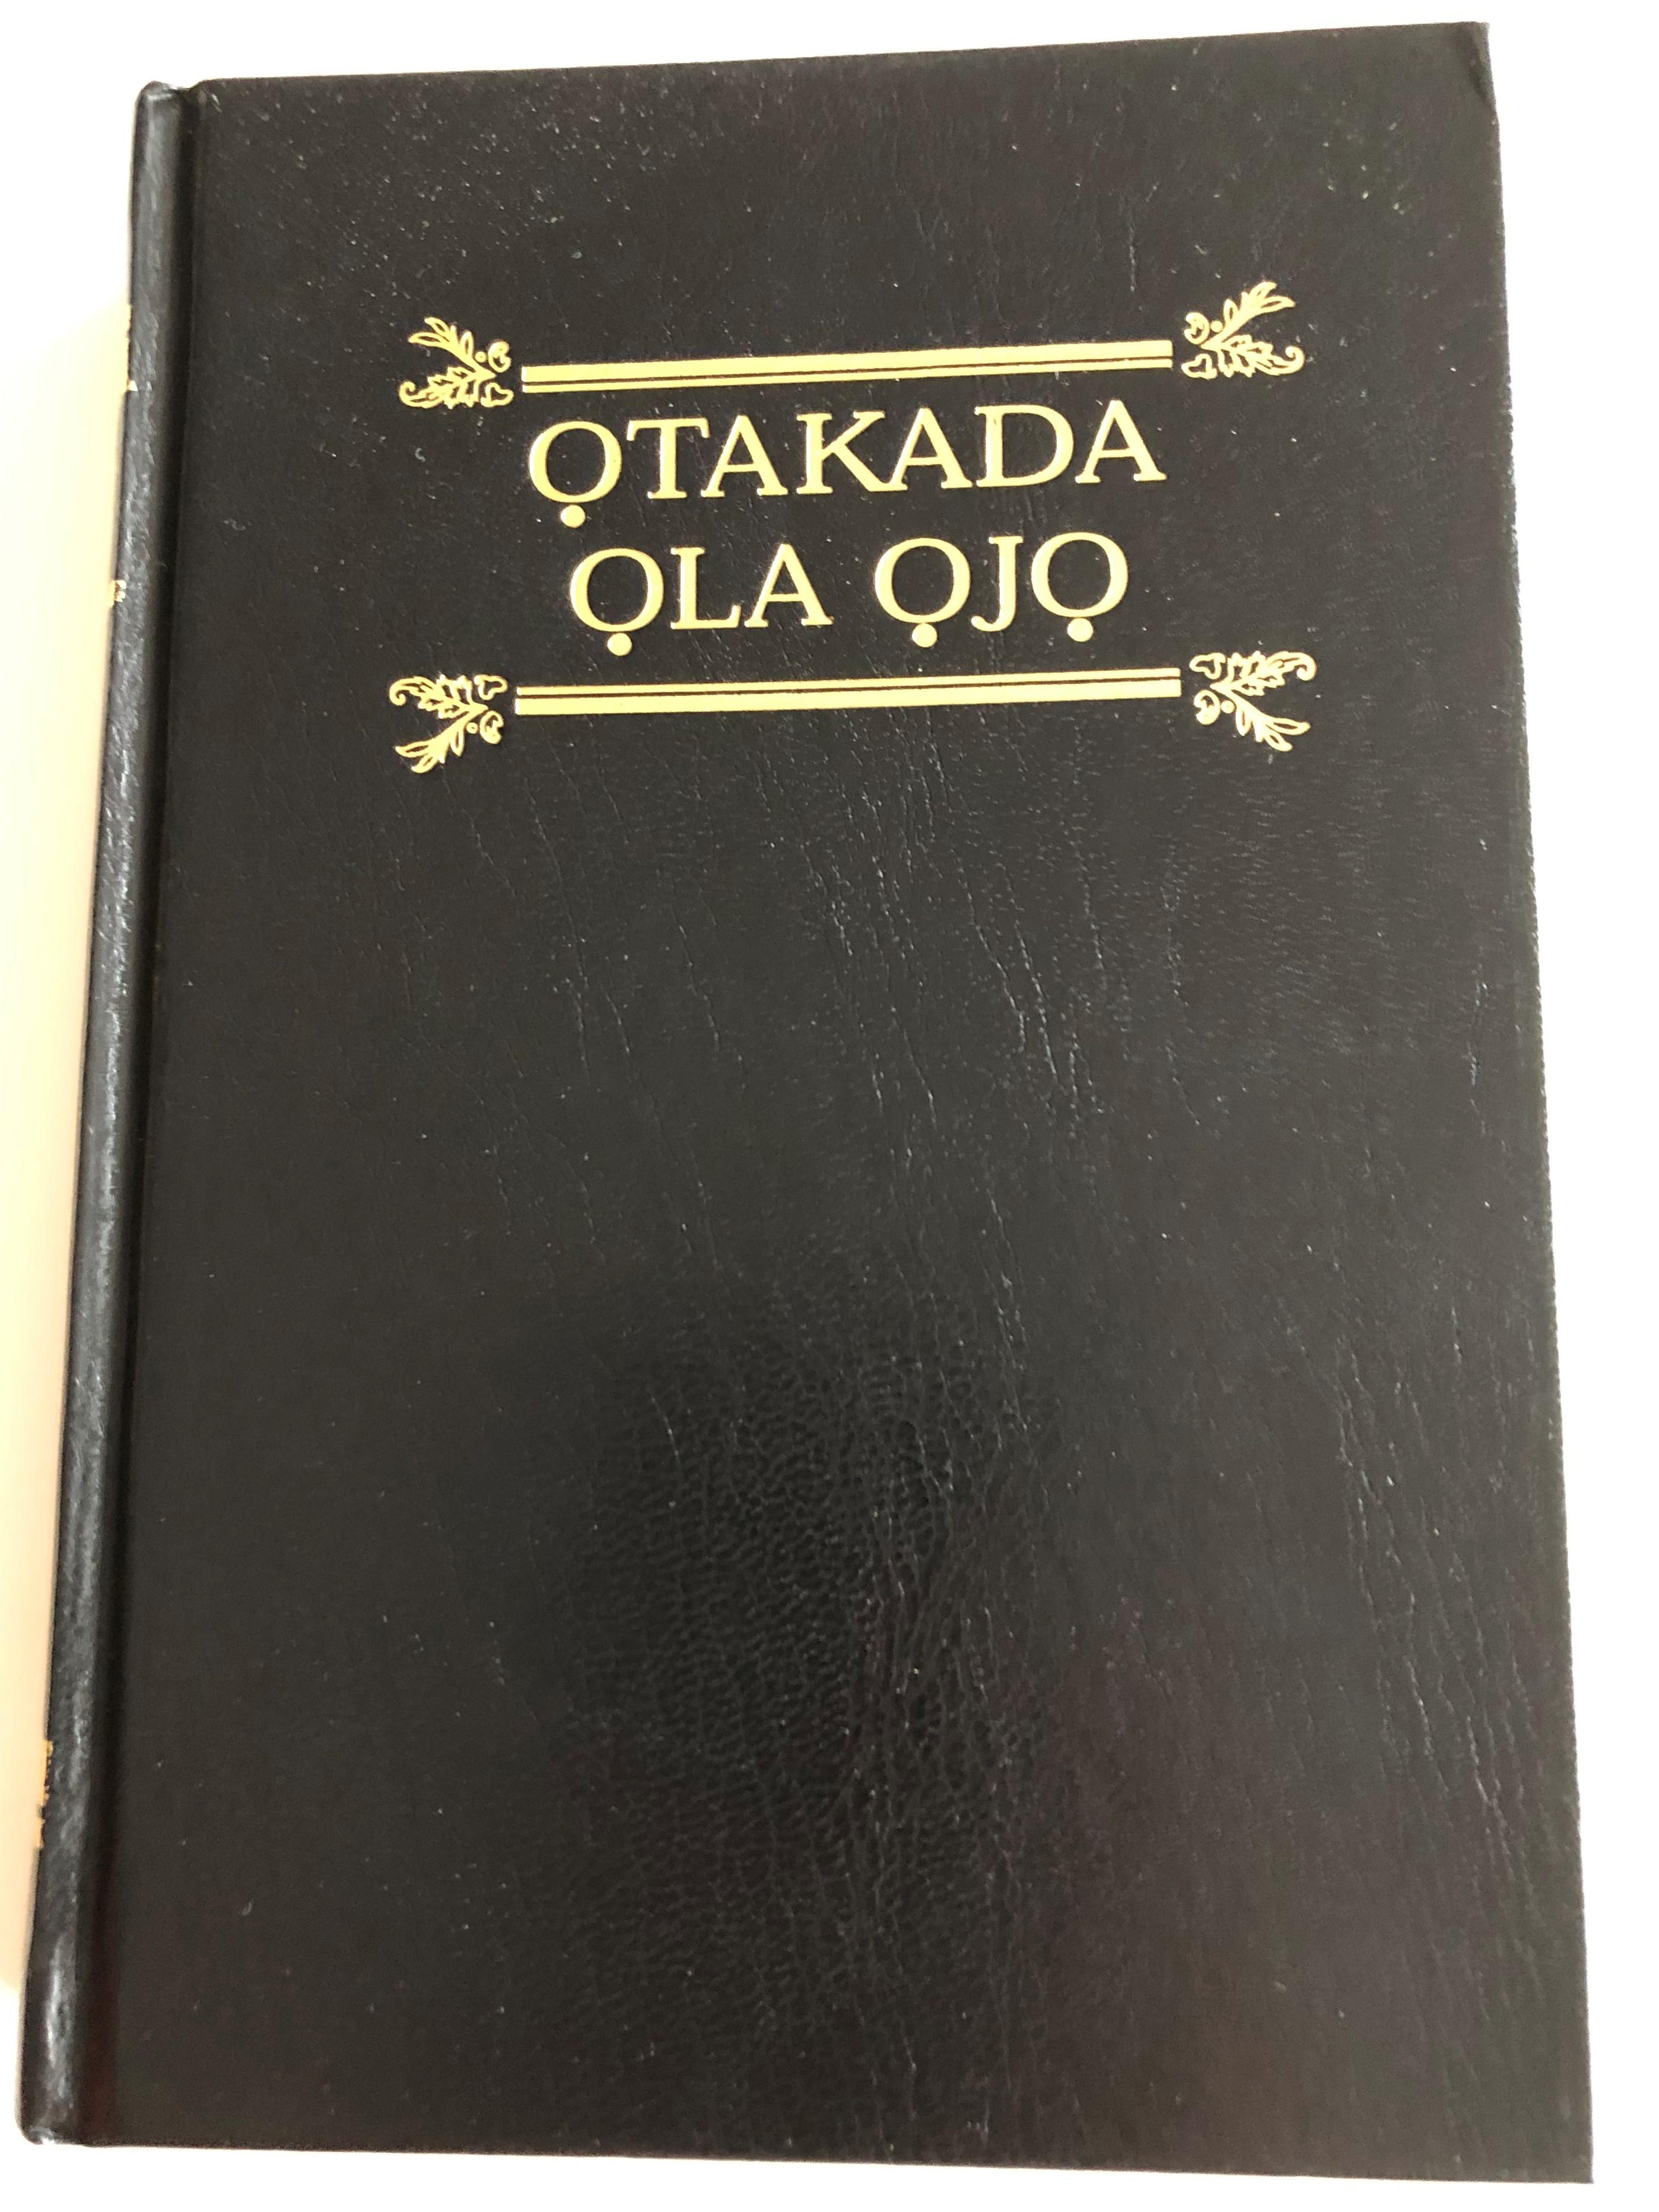 otakada-ola-ojo-holy-bible-in-igala-bible-society-of-nigeria-1970-01.jpg